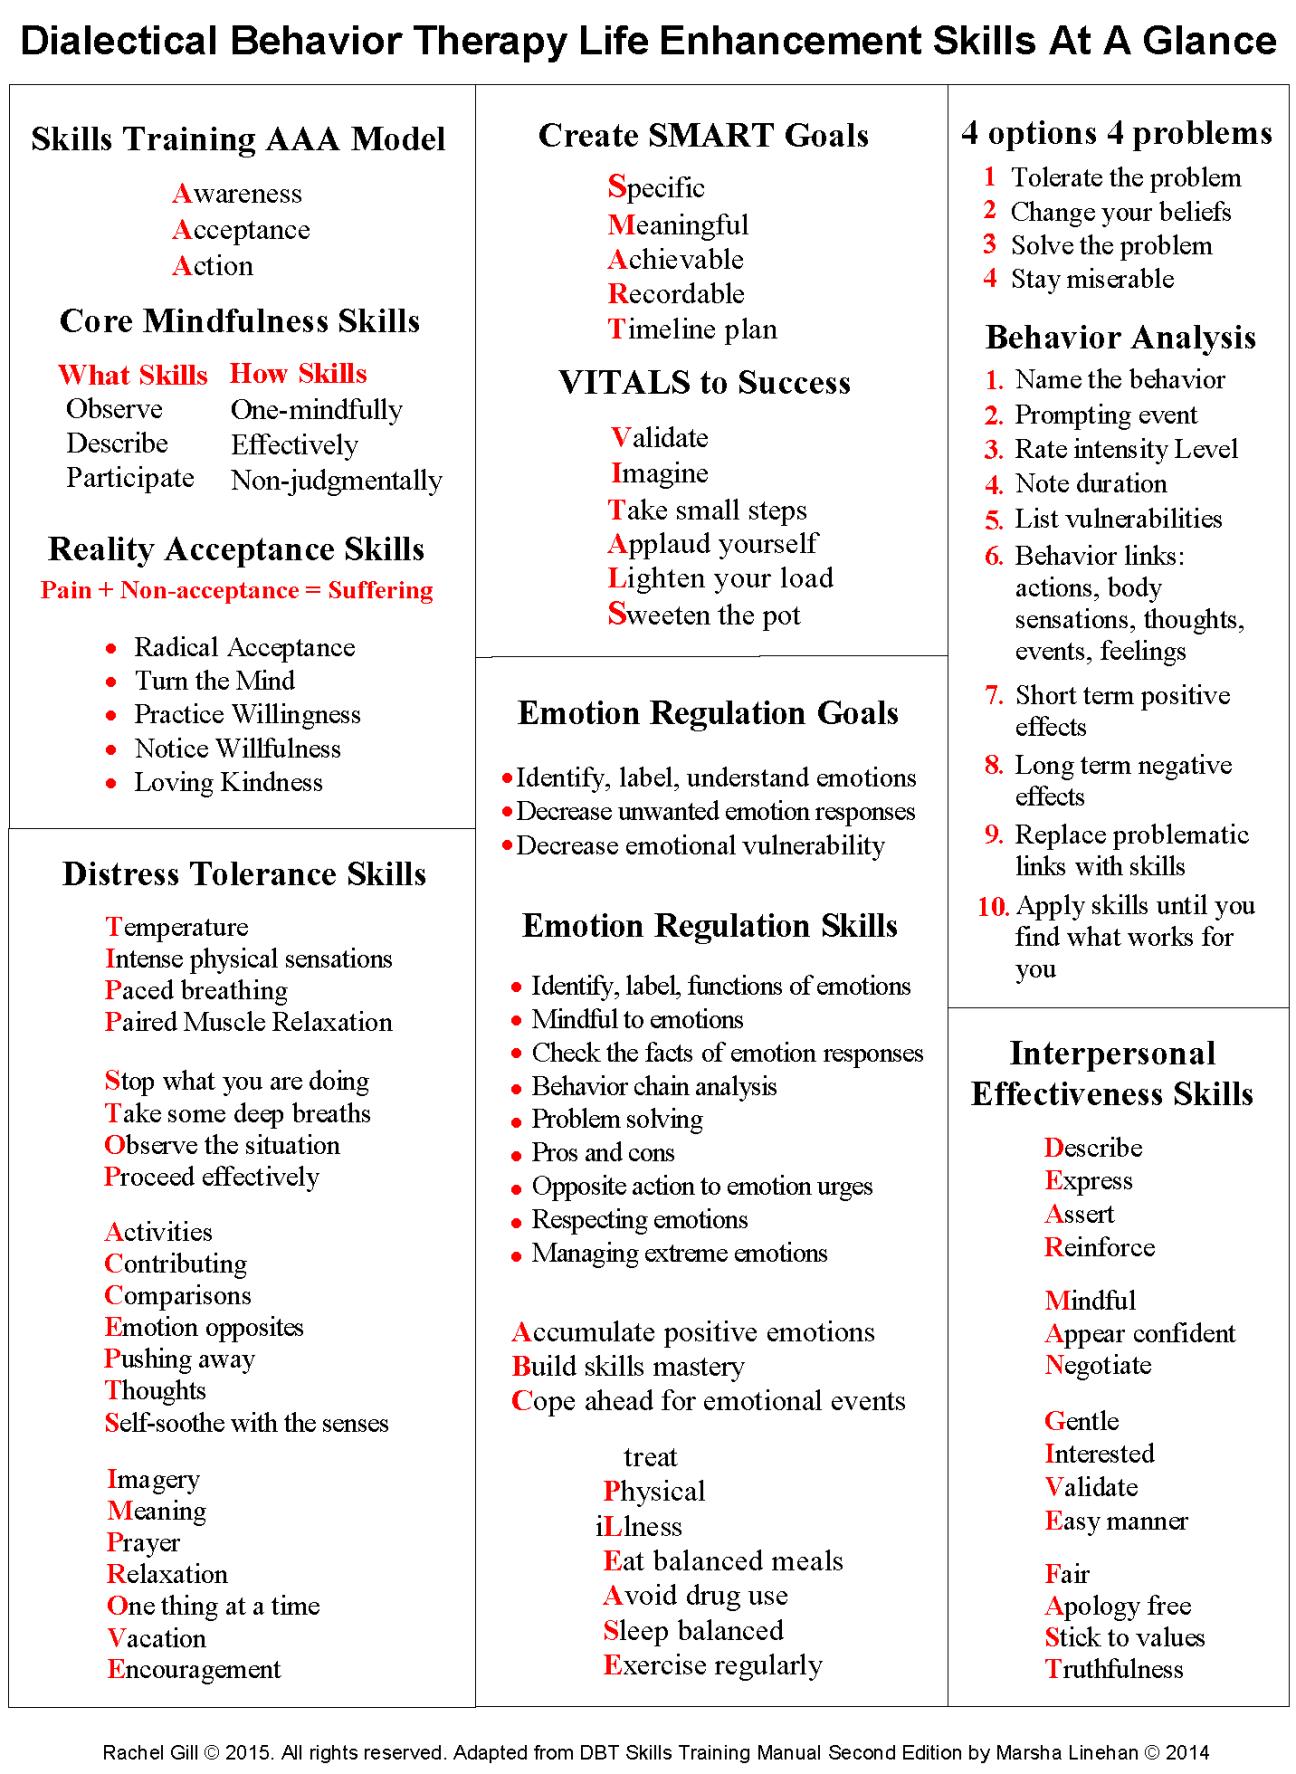 Dbt Handouts & Worksheets | Dbt Peer Connections | Self Study - Free Printable Coping Skills Worksheets